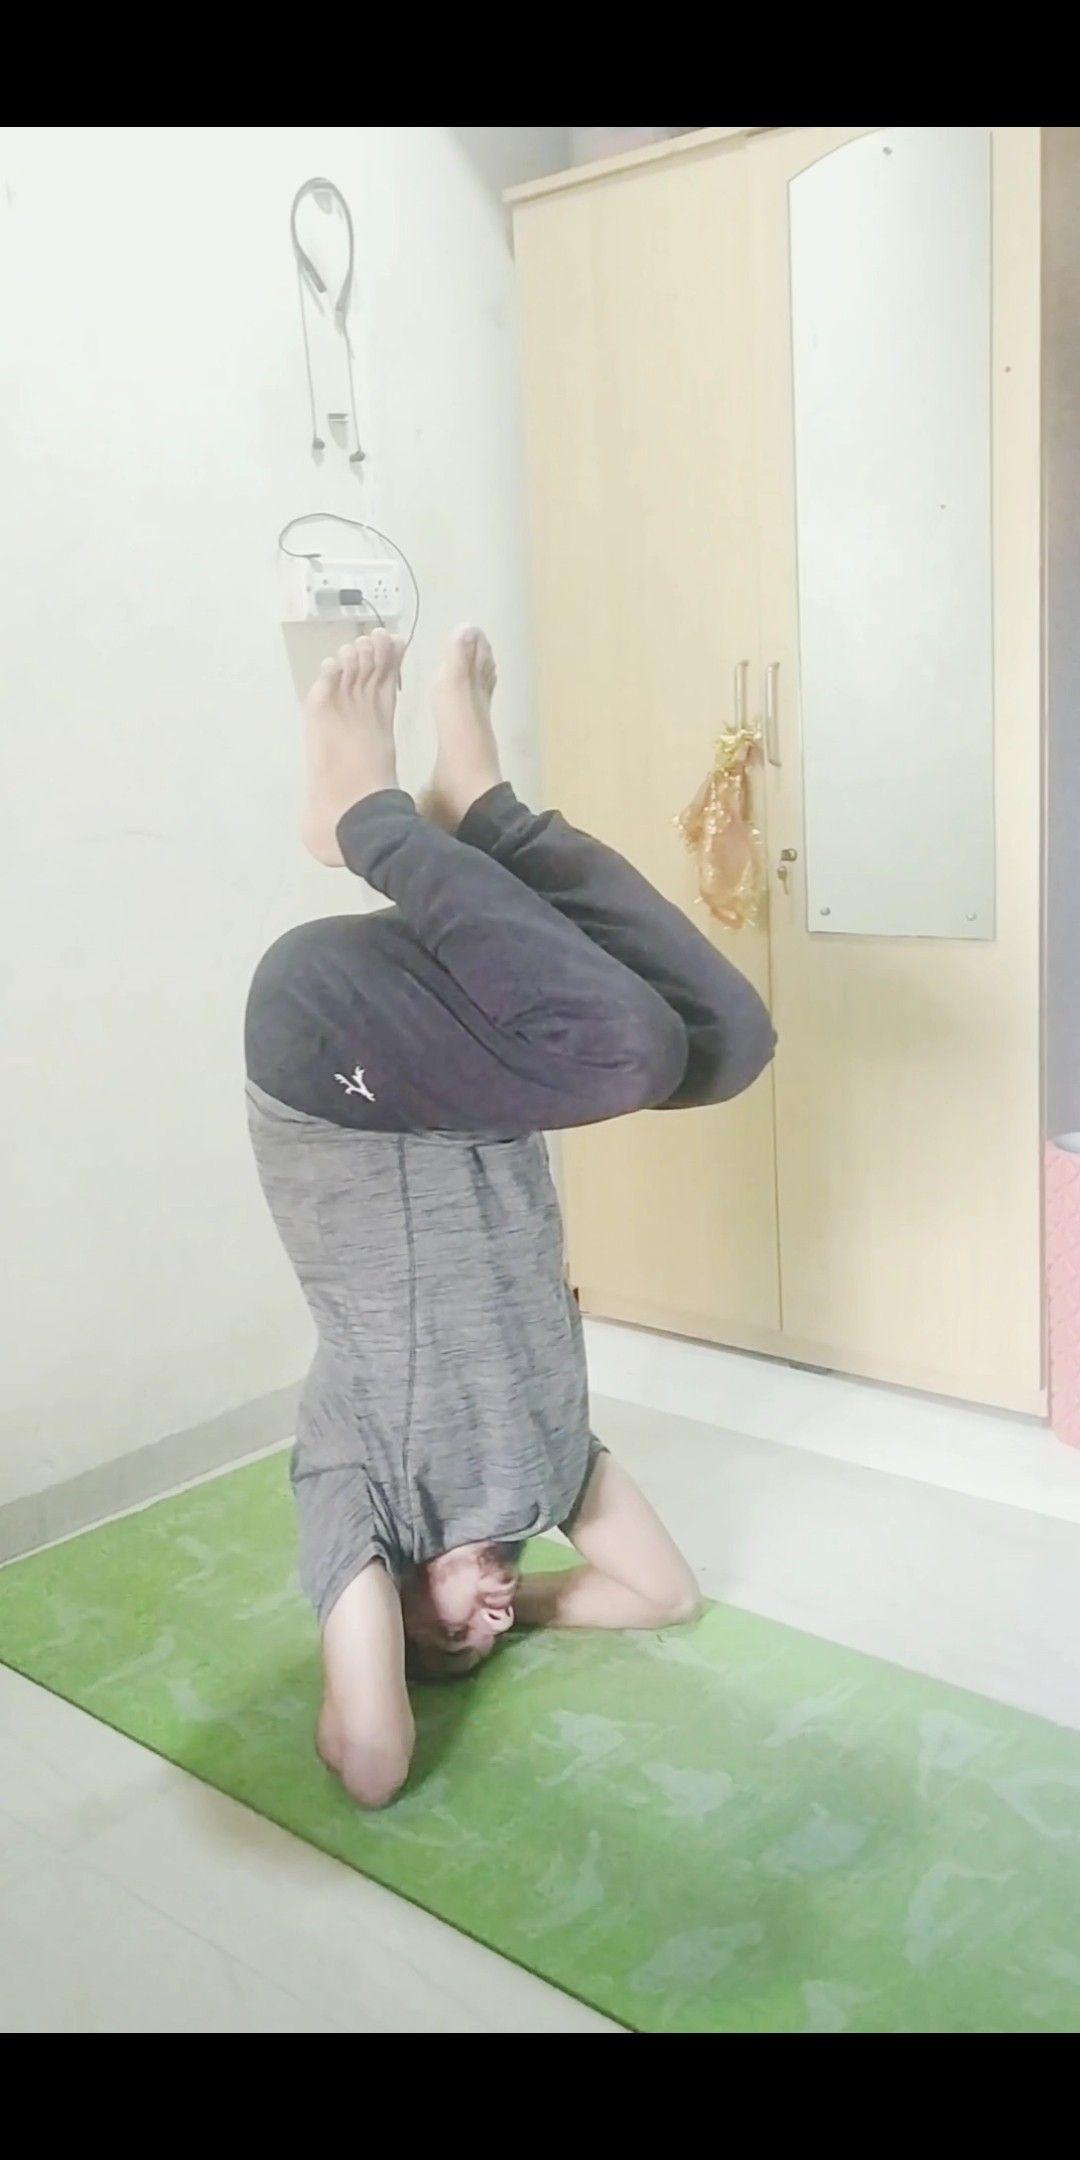 4 simple steps to perform sirsasana pose for biggners |easy steps for salambha sirsasana to biggners